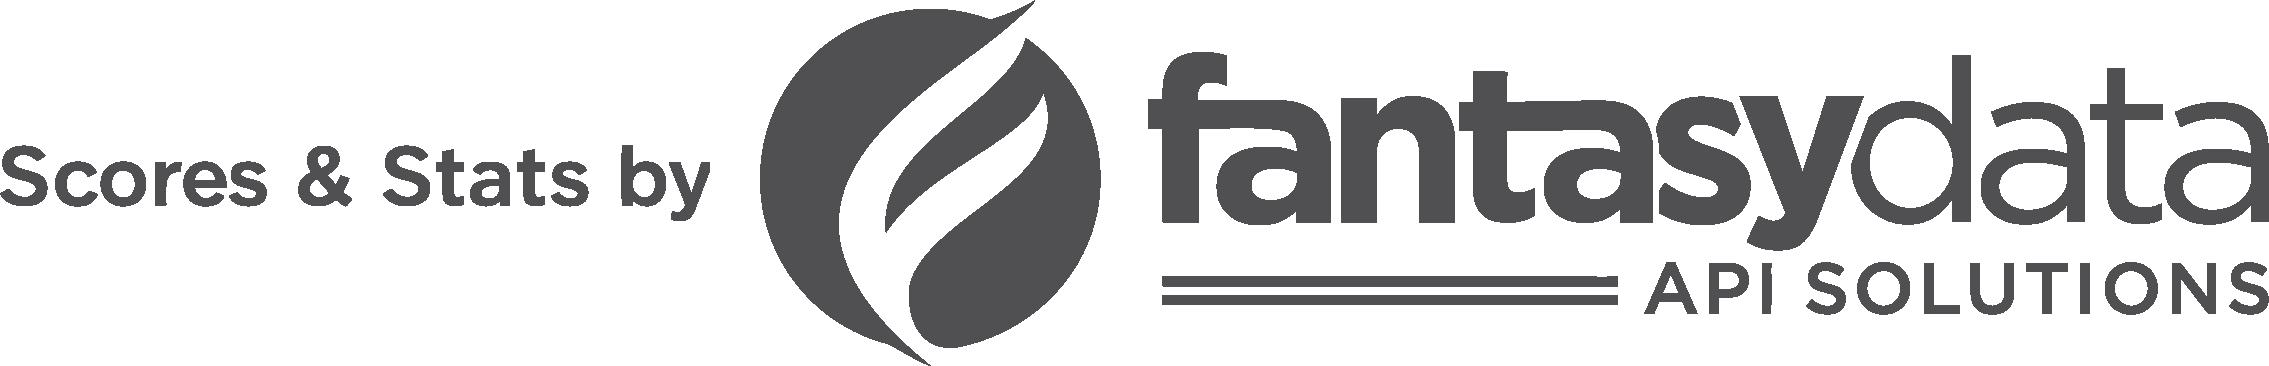 Scores & Stats by FantasyData